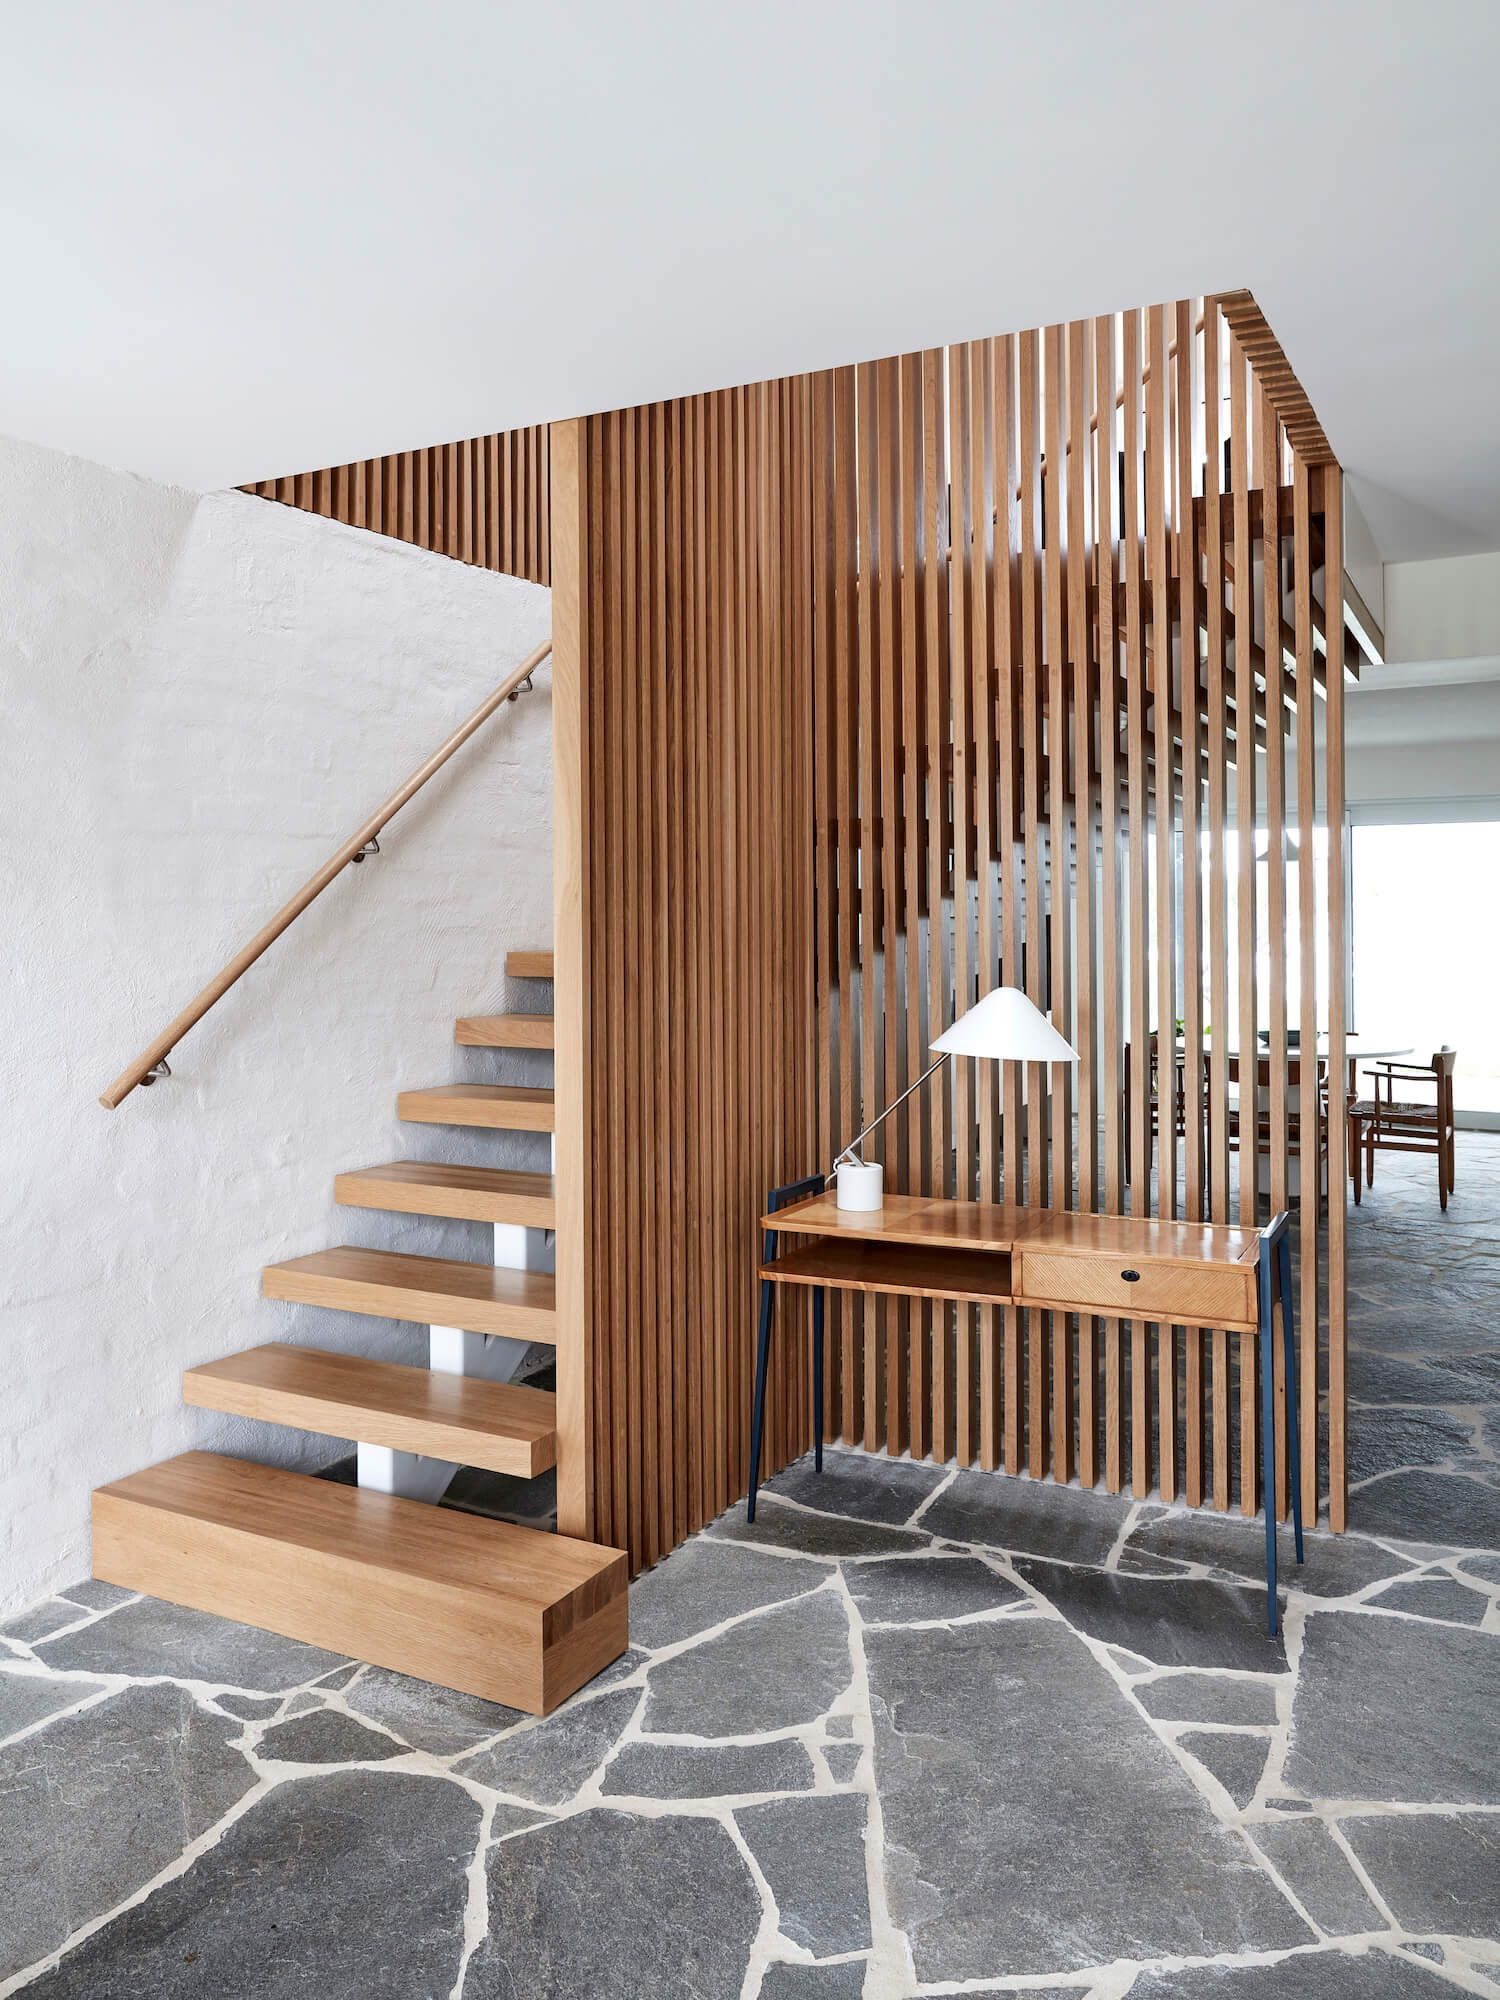 Best Portsea Beach House By Studio Esteta Staircase Design 640 x 480